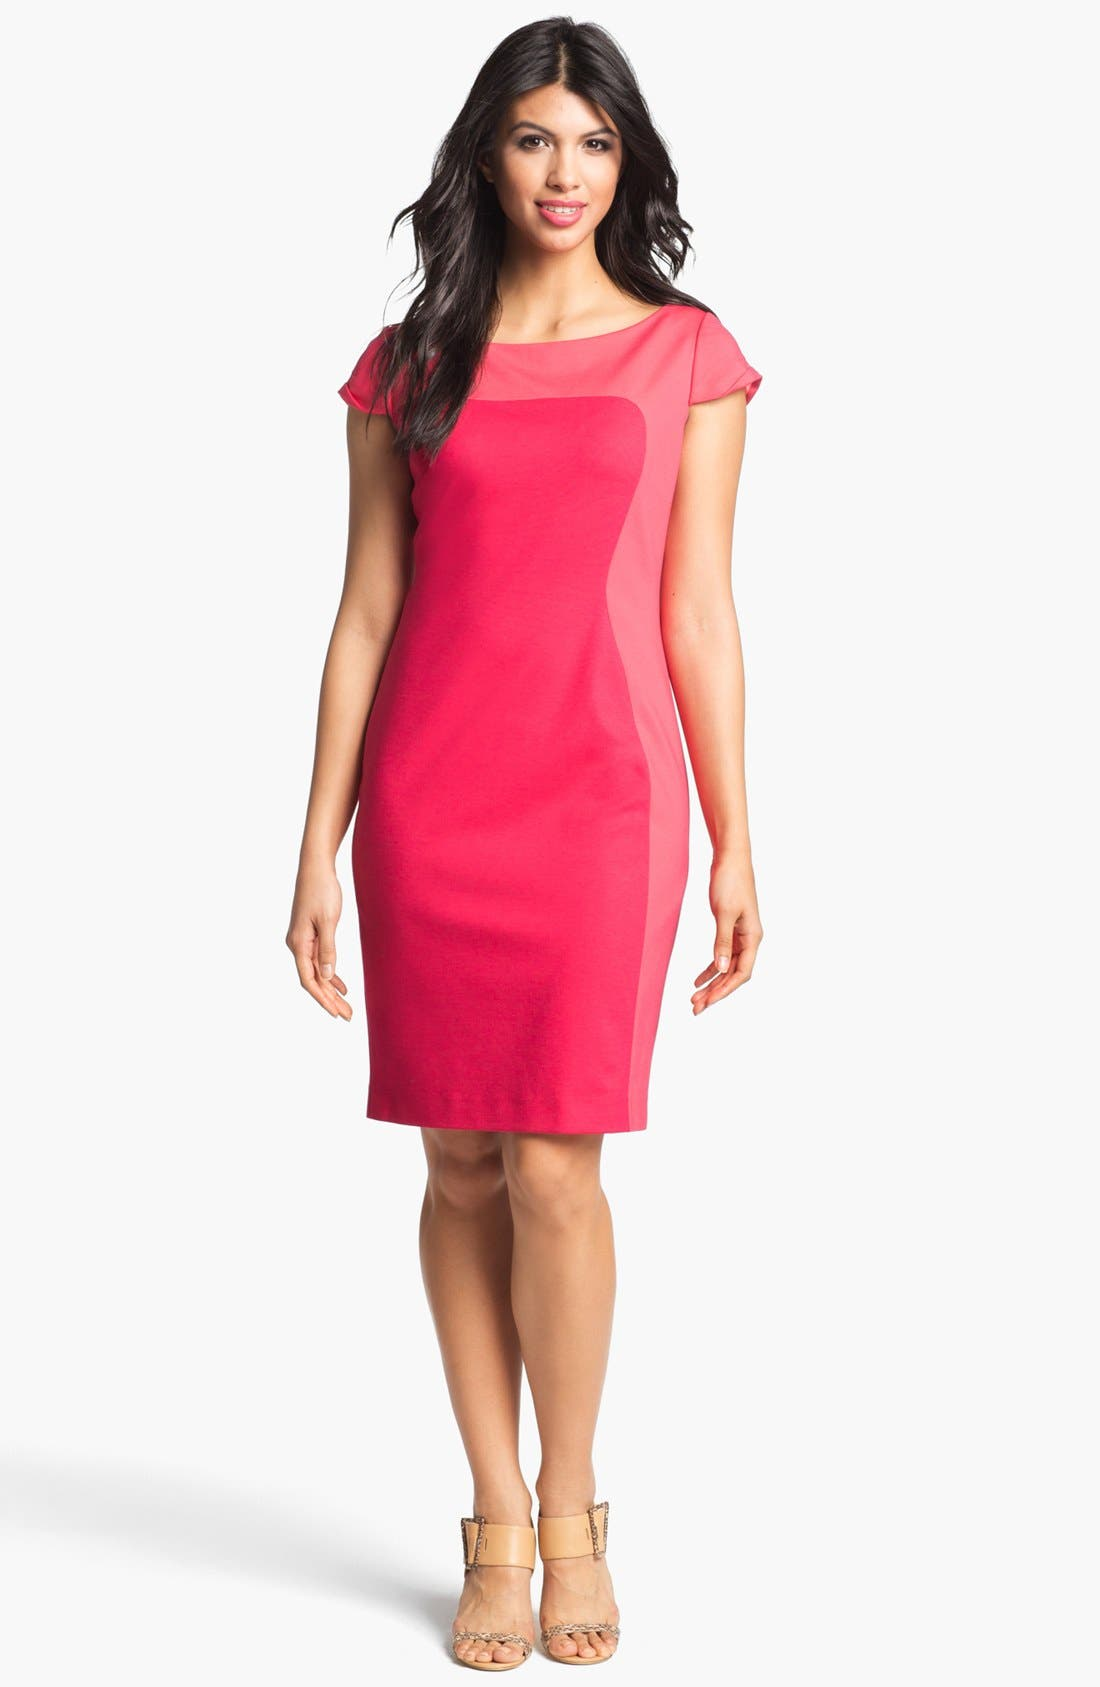 Alternate Image 1 Selected - Elie Tahari 'Dixie' Dress